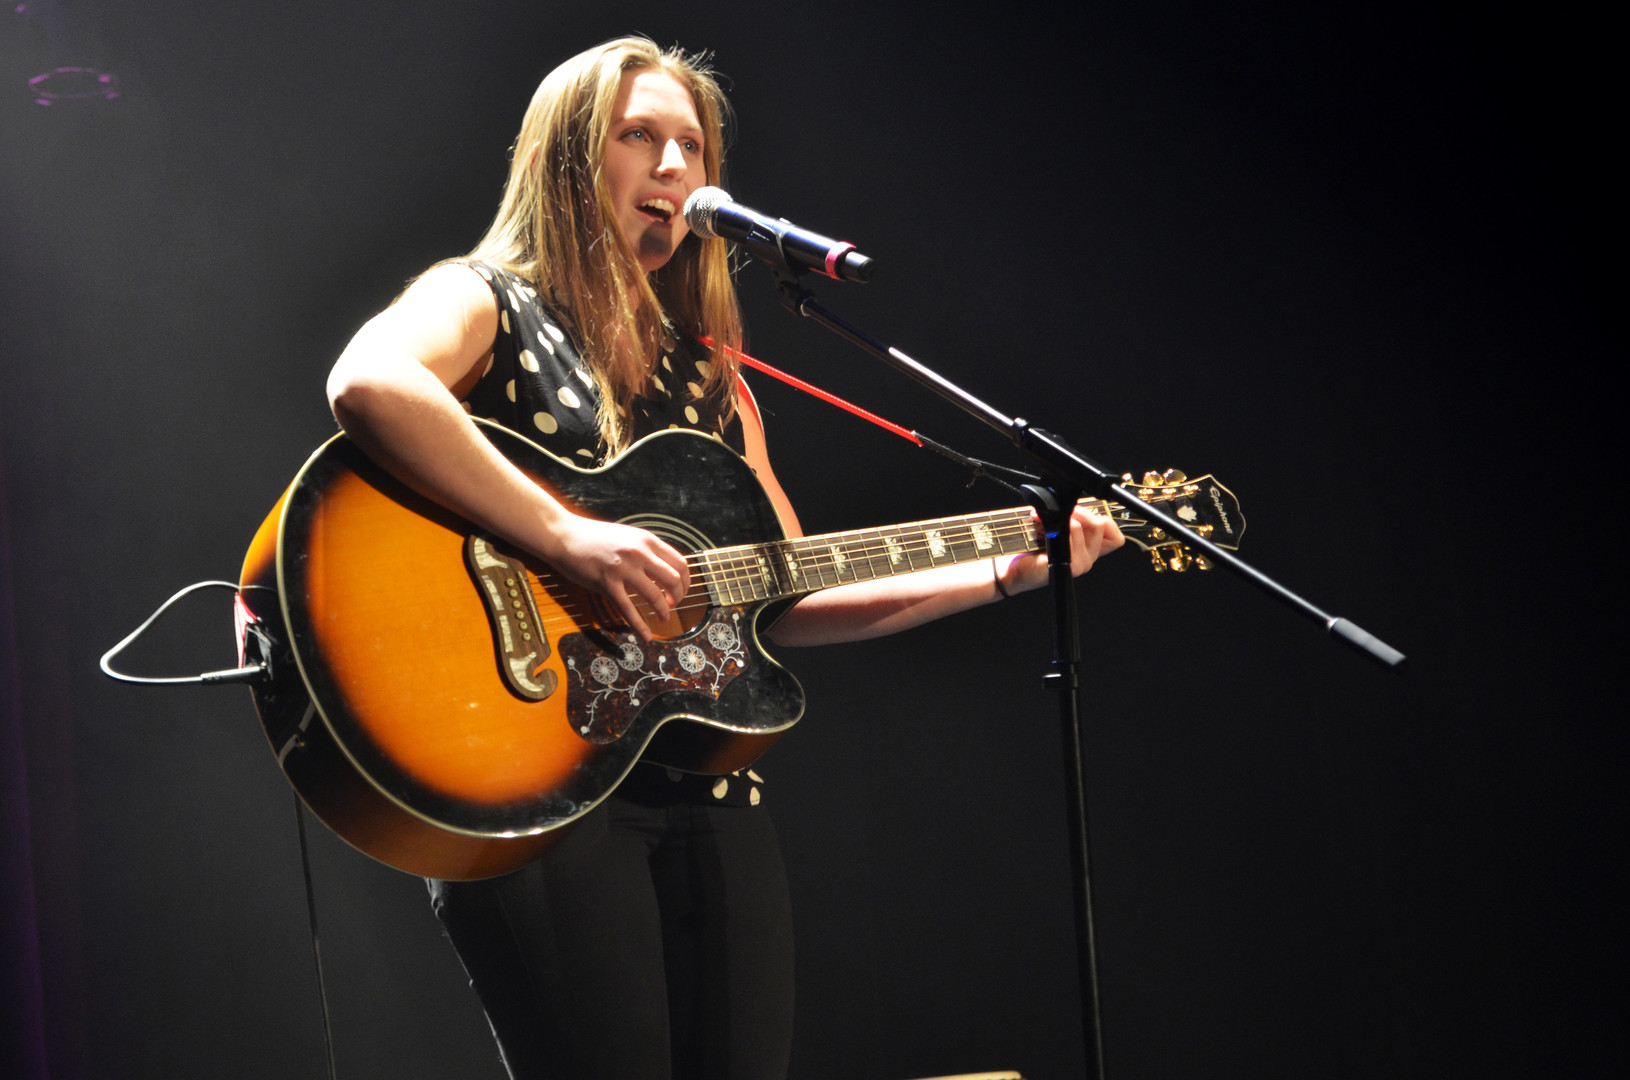 Valérie Gionet